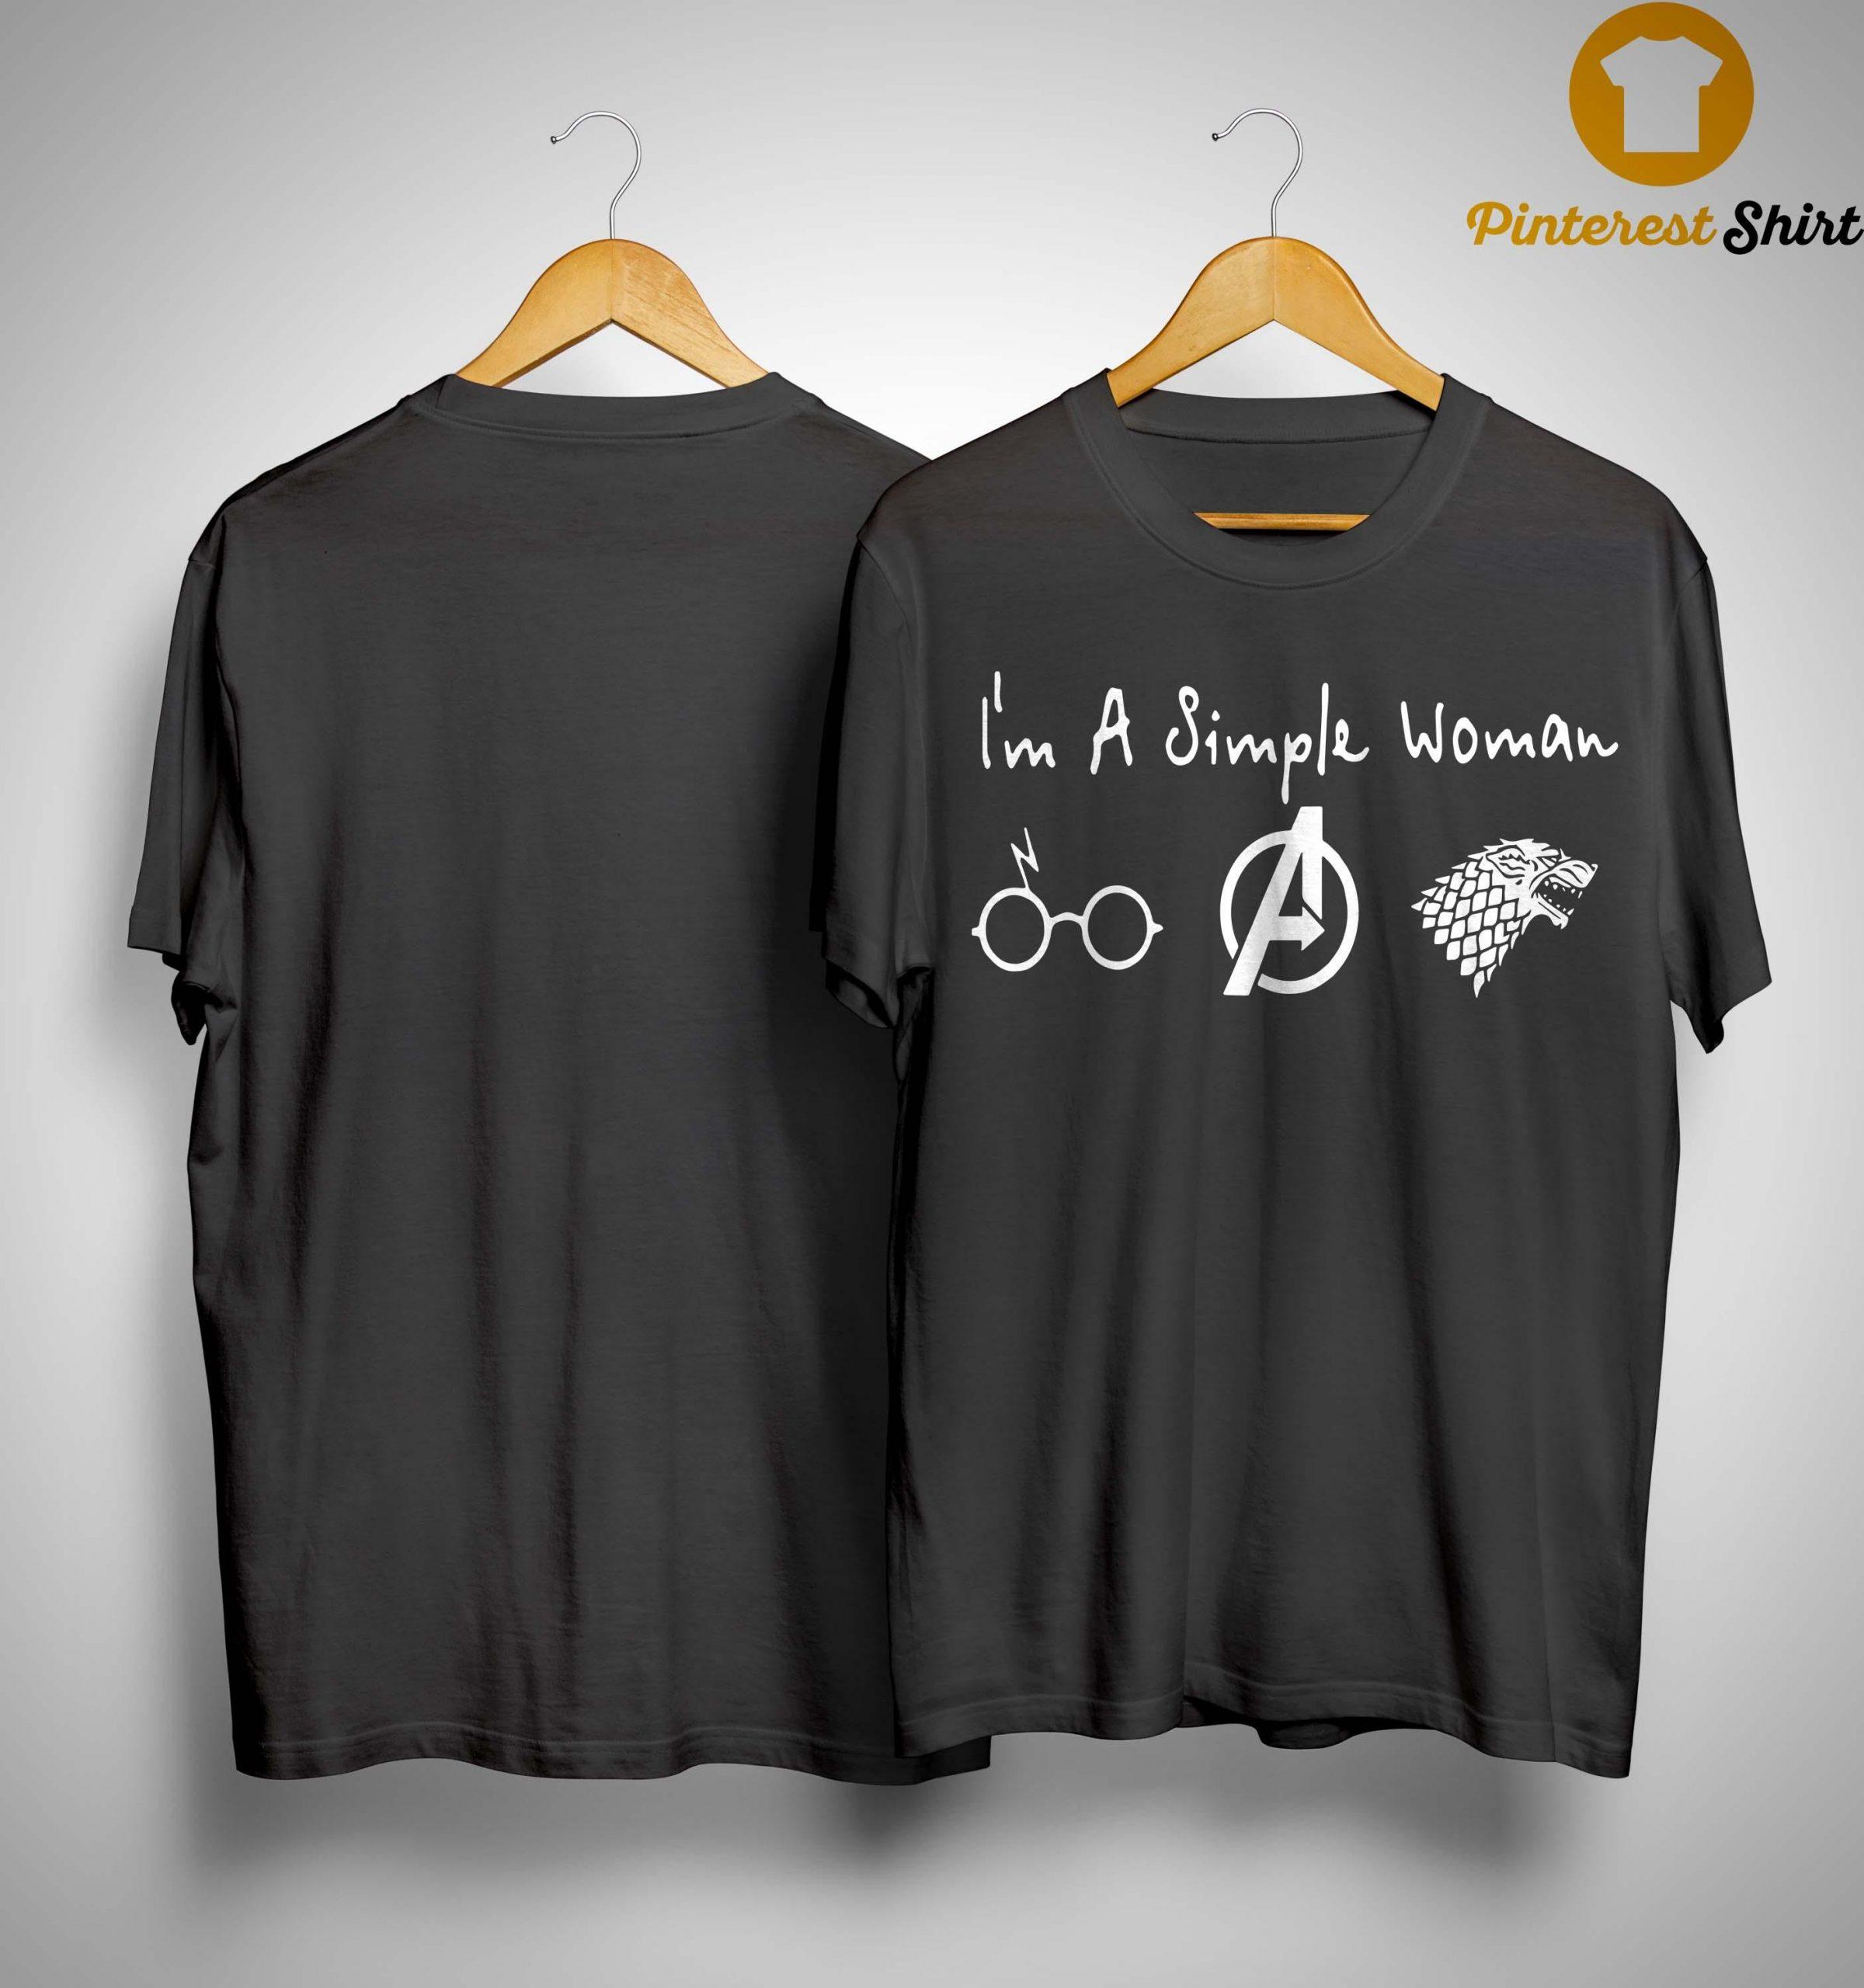 I'm A Simple Woman Like Harry Potter Avengers Stark Shirt